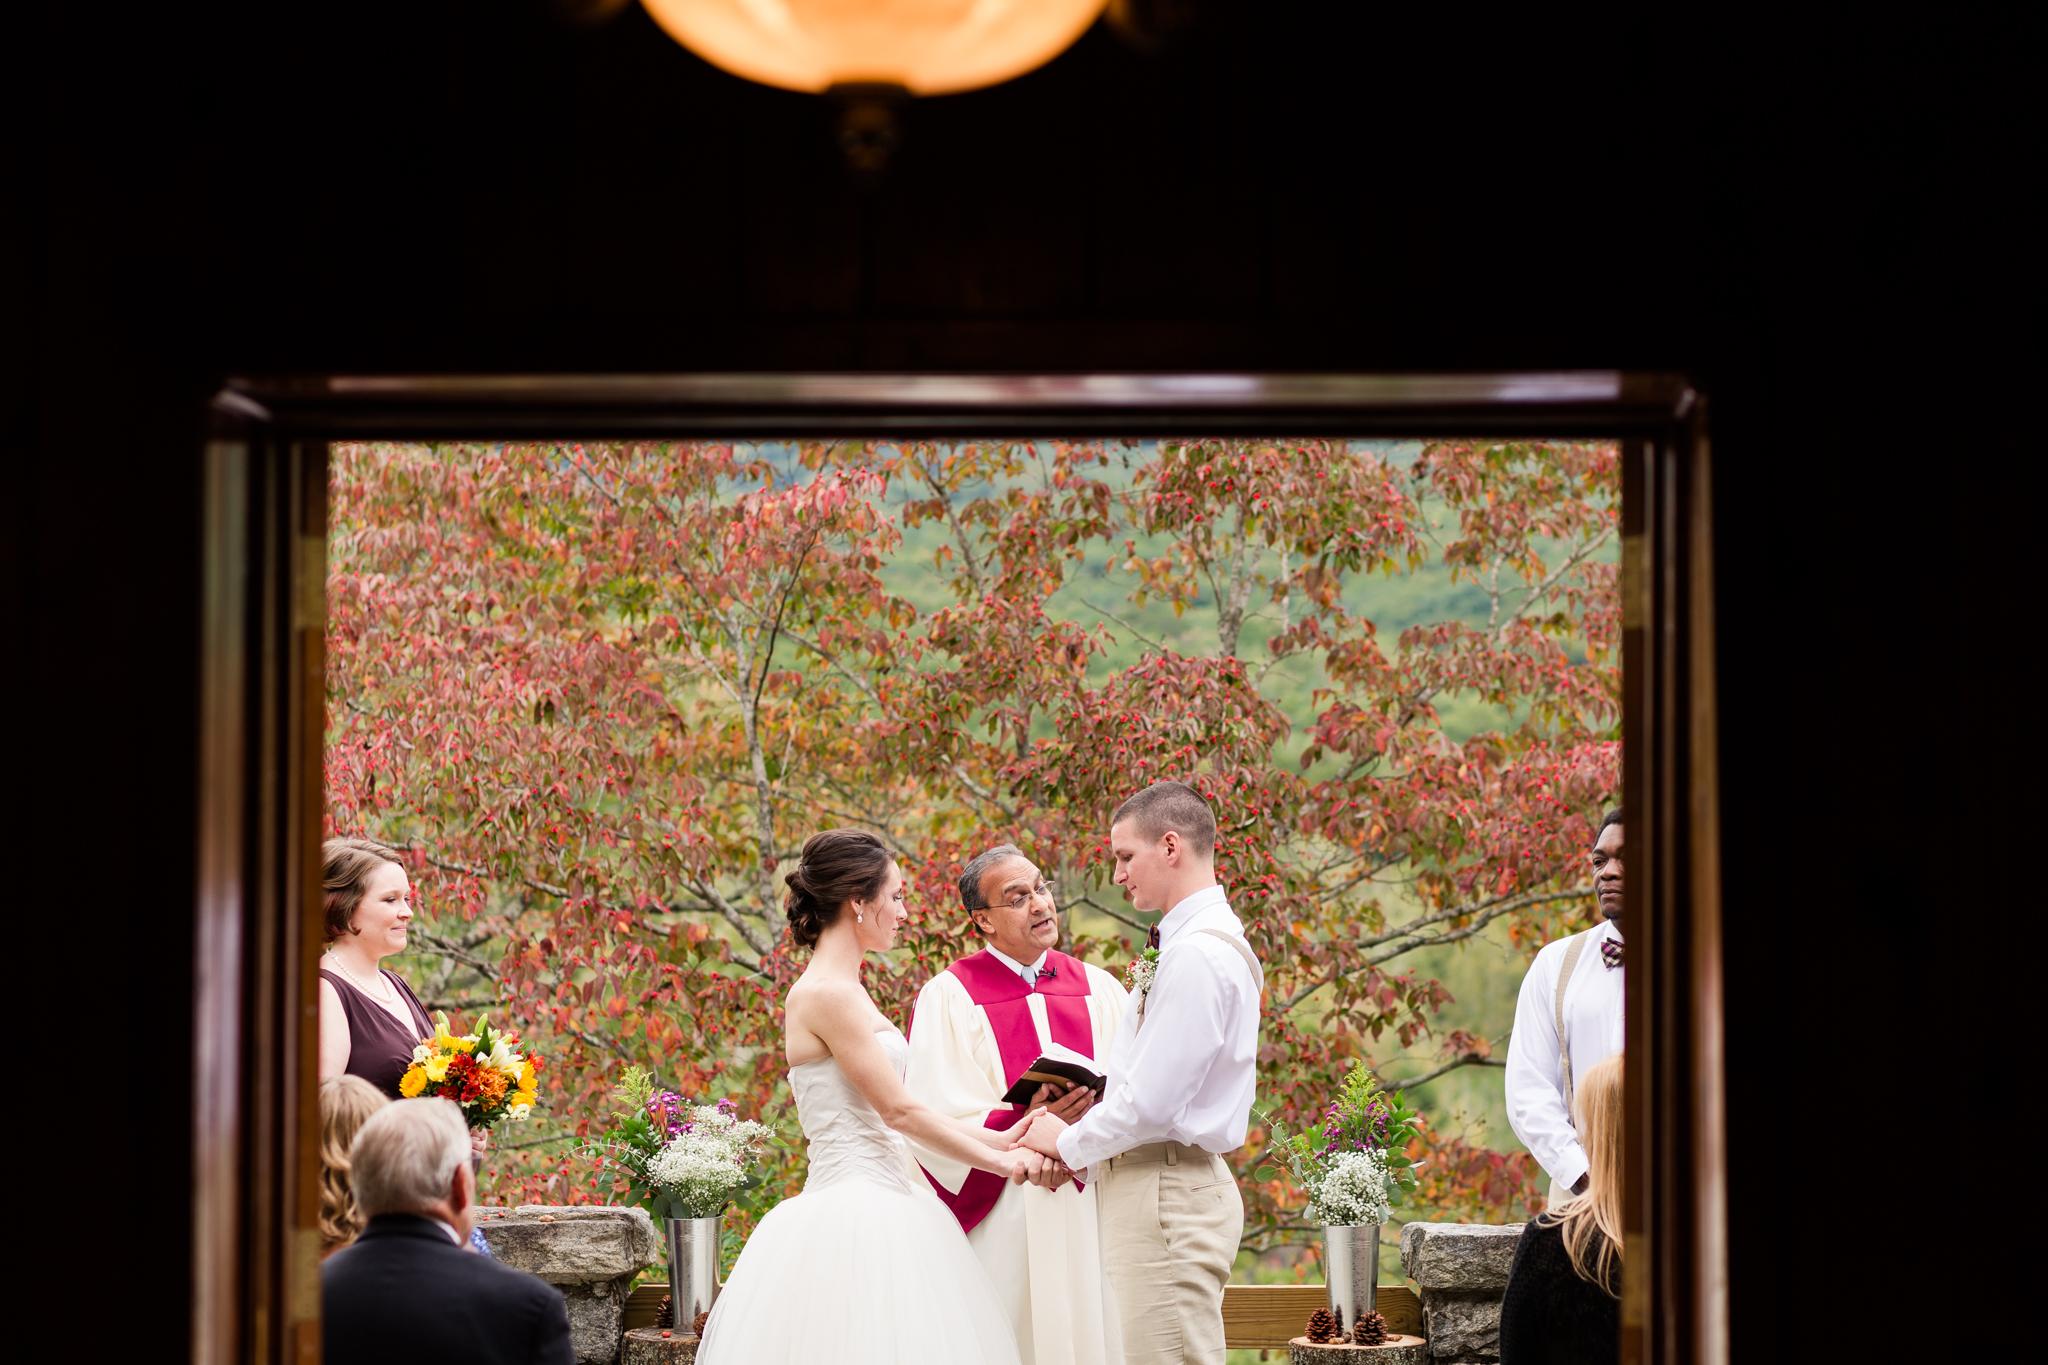 Ashley-Amber-Photo-Outdoor-Wedding-Photography-141410.jpg